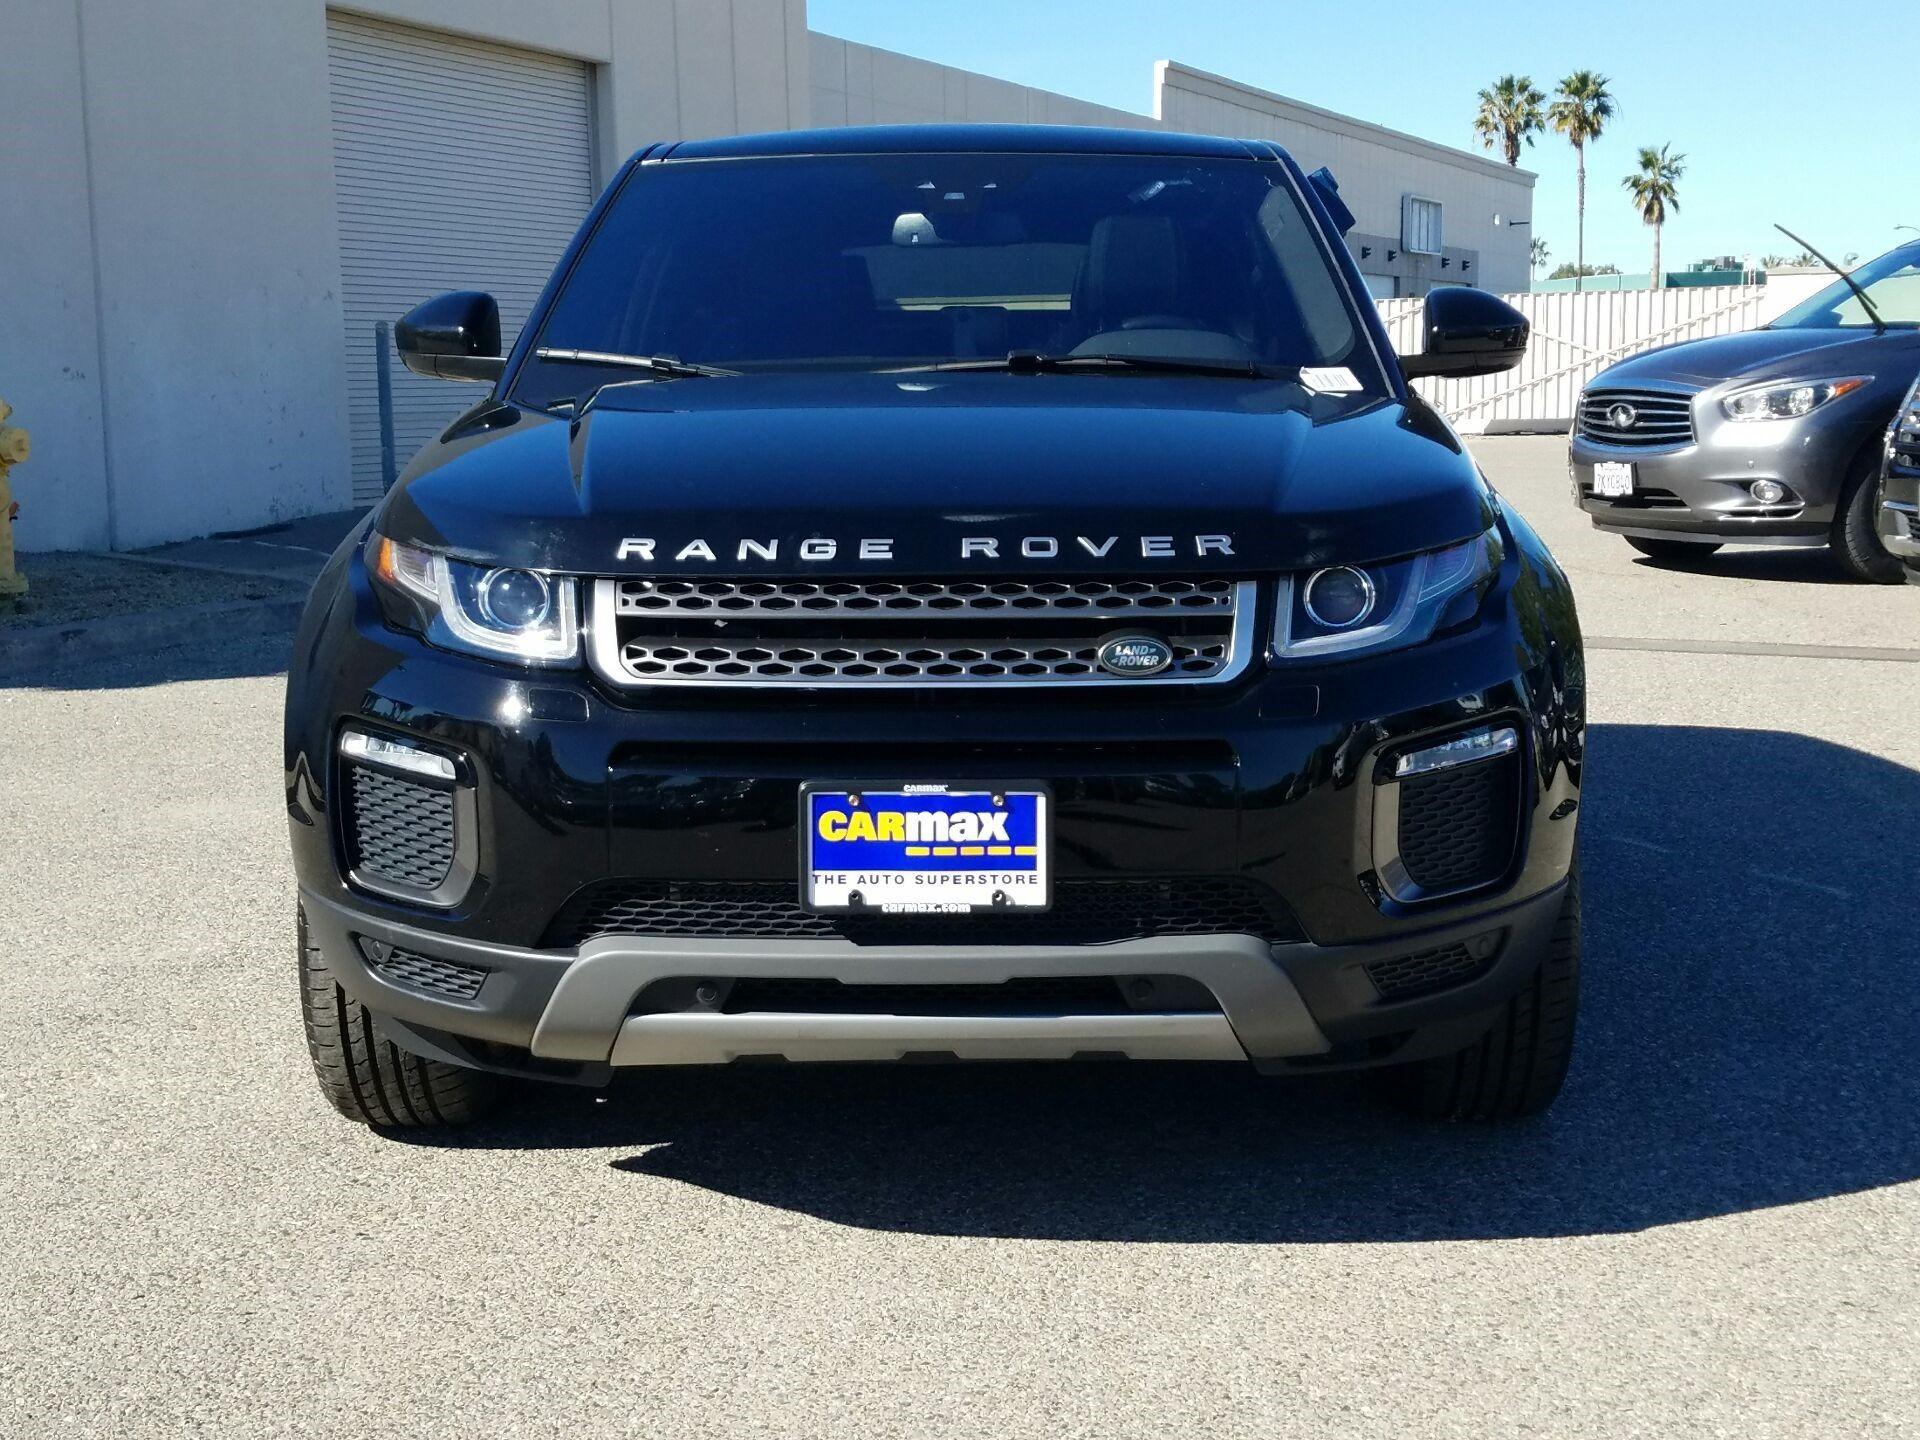 Used 2017 Land Rover Range Rover Evoque In Fresno California Carmax Range Rover Evoque Land Rover Range Rover